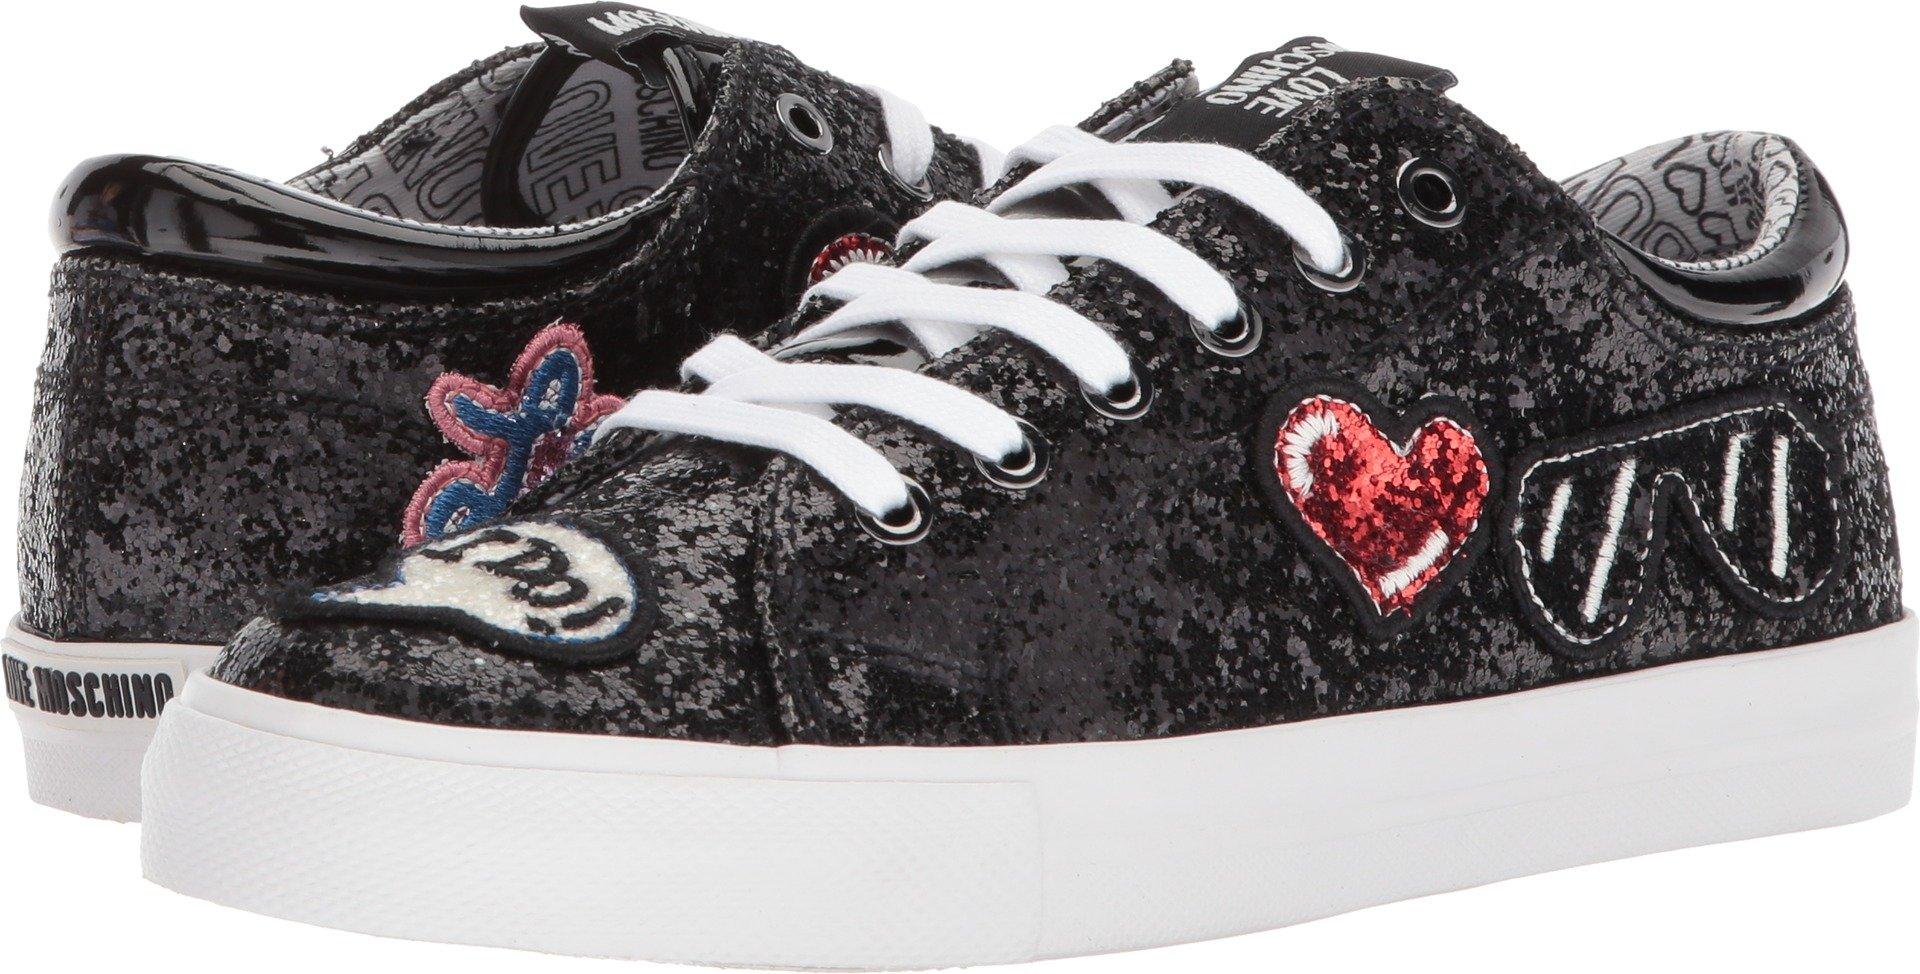 Love Moschino Women's Sneaker w/Patches Fantasty Color Black 35 M EU